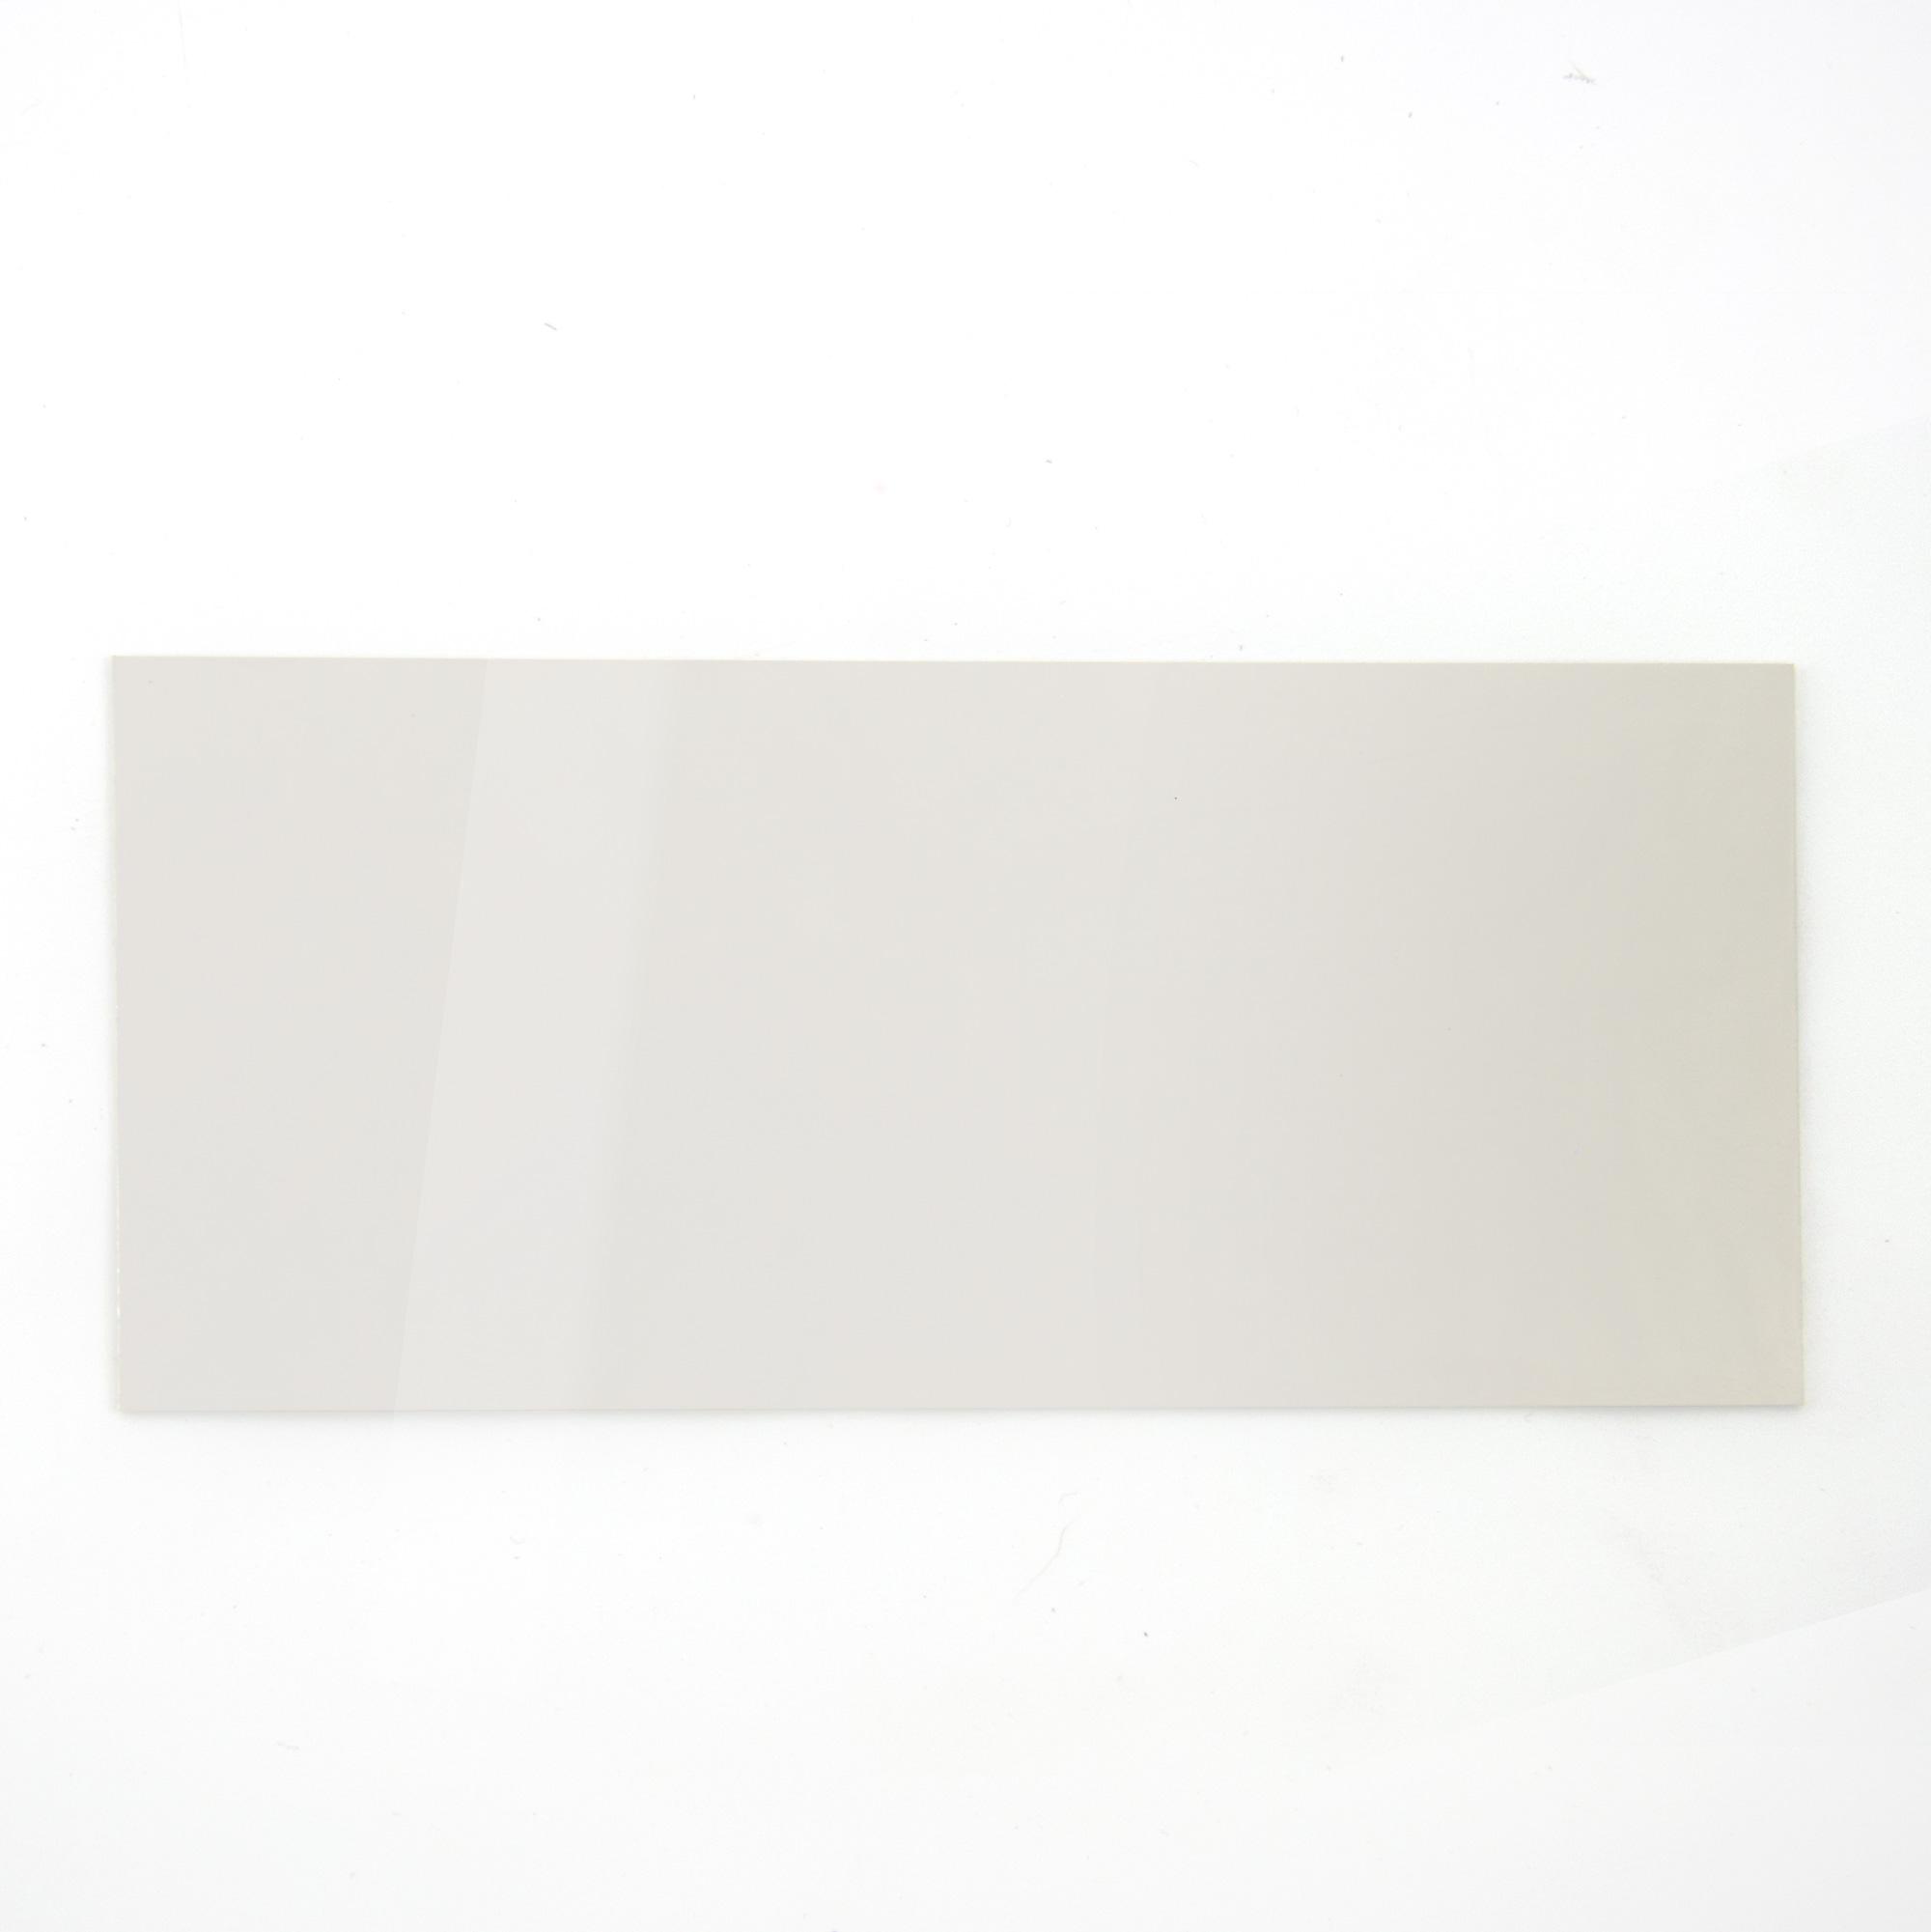 Acier inoxydable finition miroir - échantillon